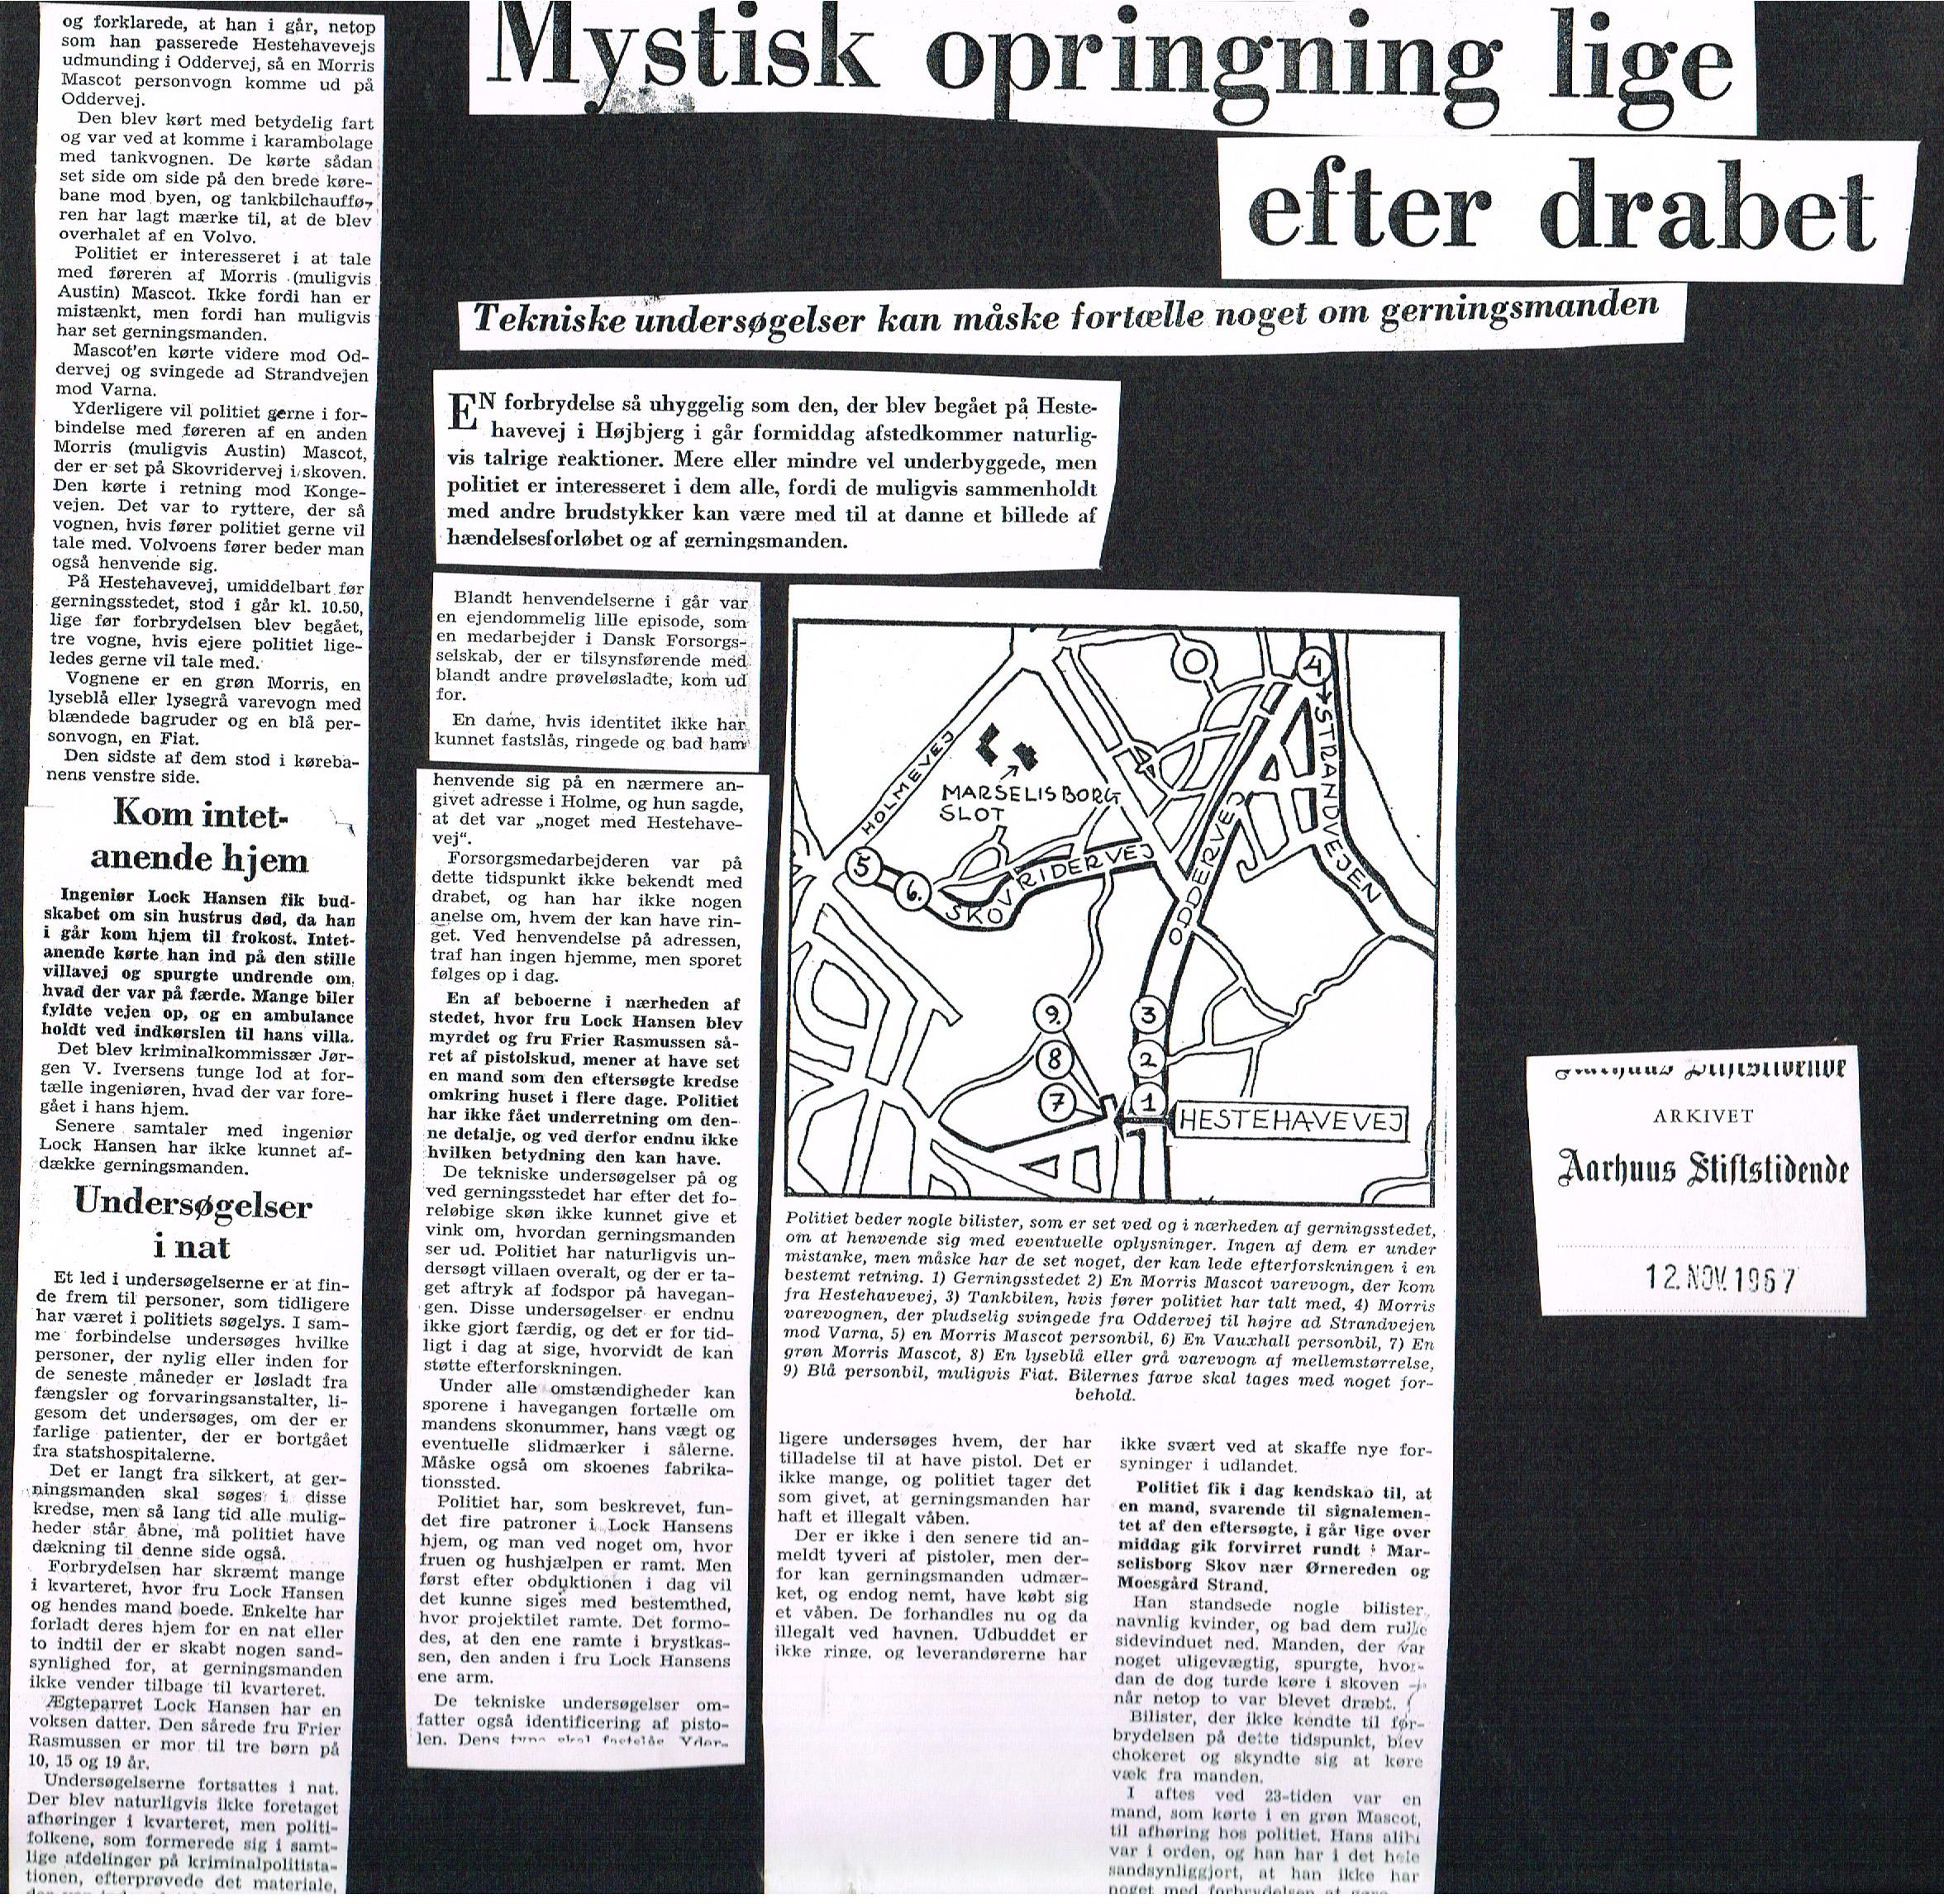 Højbjerg-drabet Aarhus Stiftstidende 12. november 1967